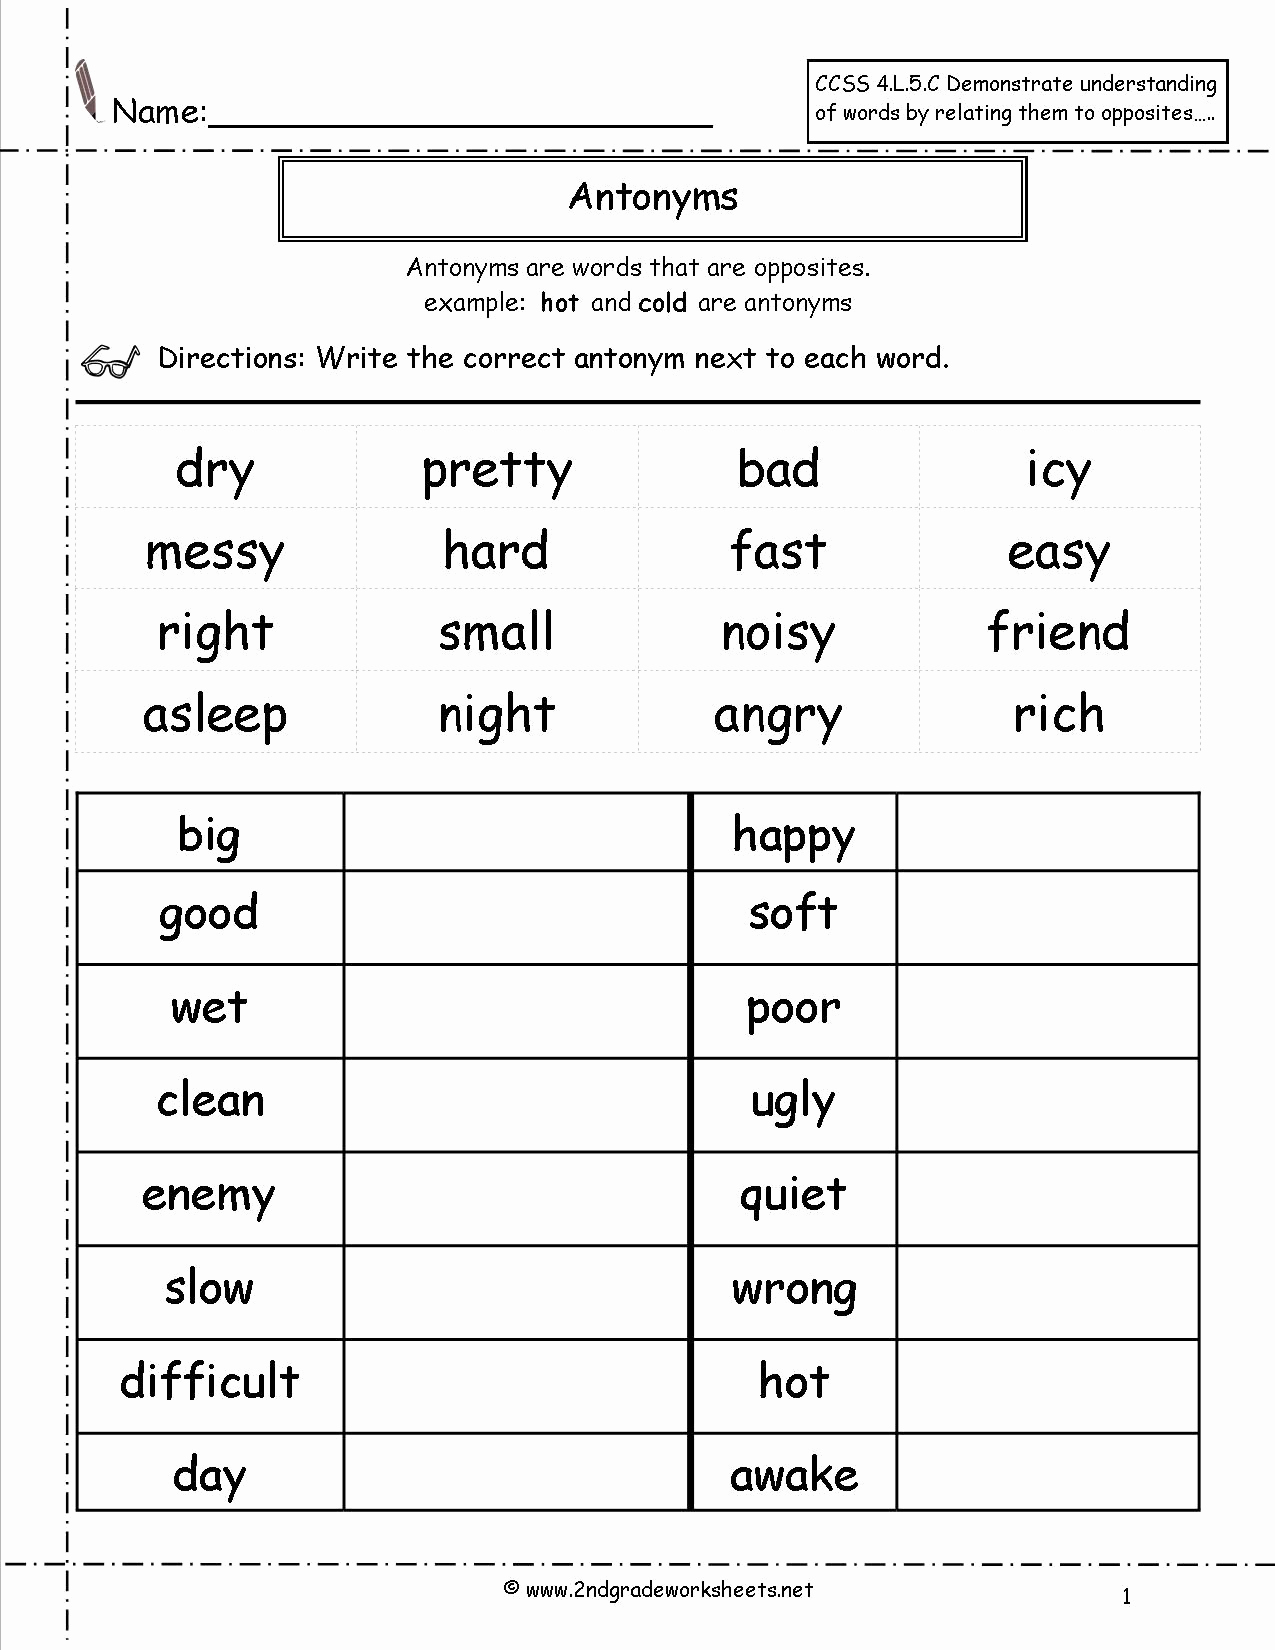 2nd Grade Grammar Worksheets Pdf Beautiful 2nd Grade Grammar Worksheets Pdf New Free Language Grammar